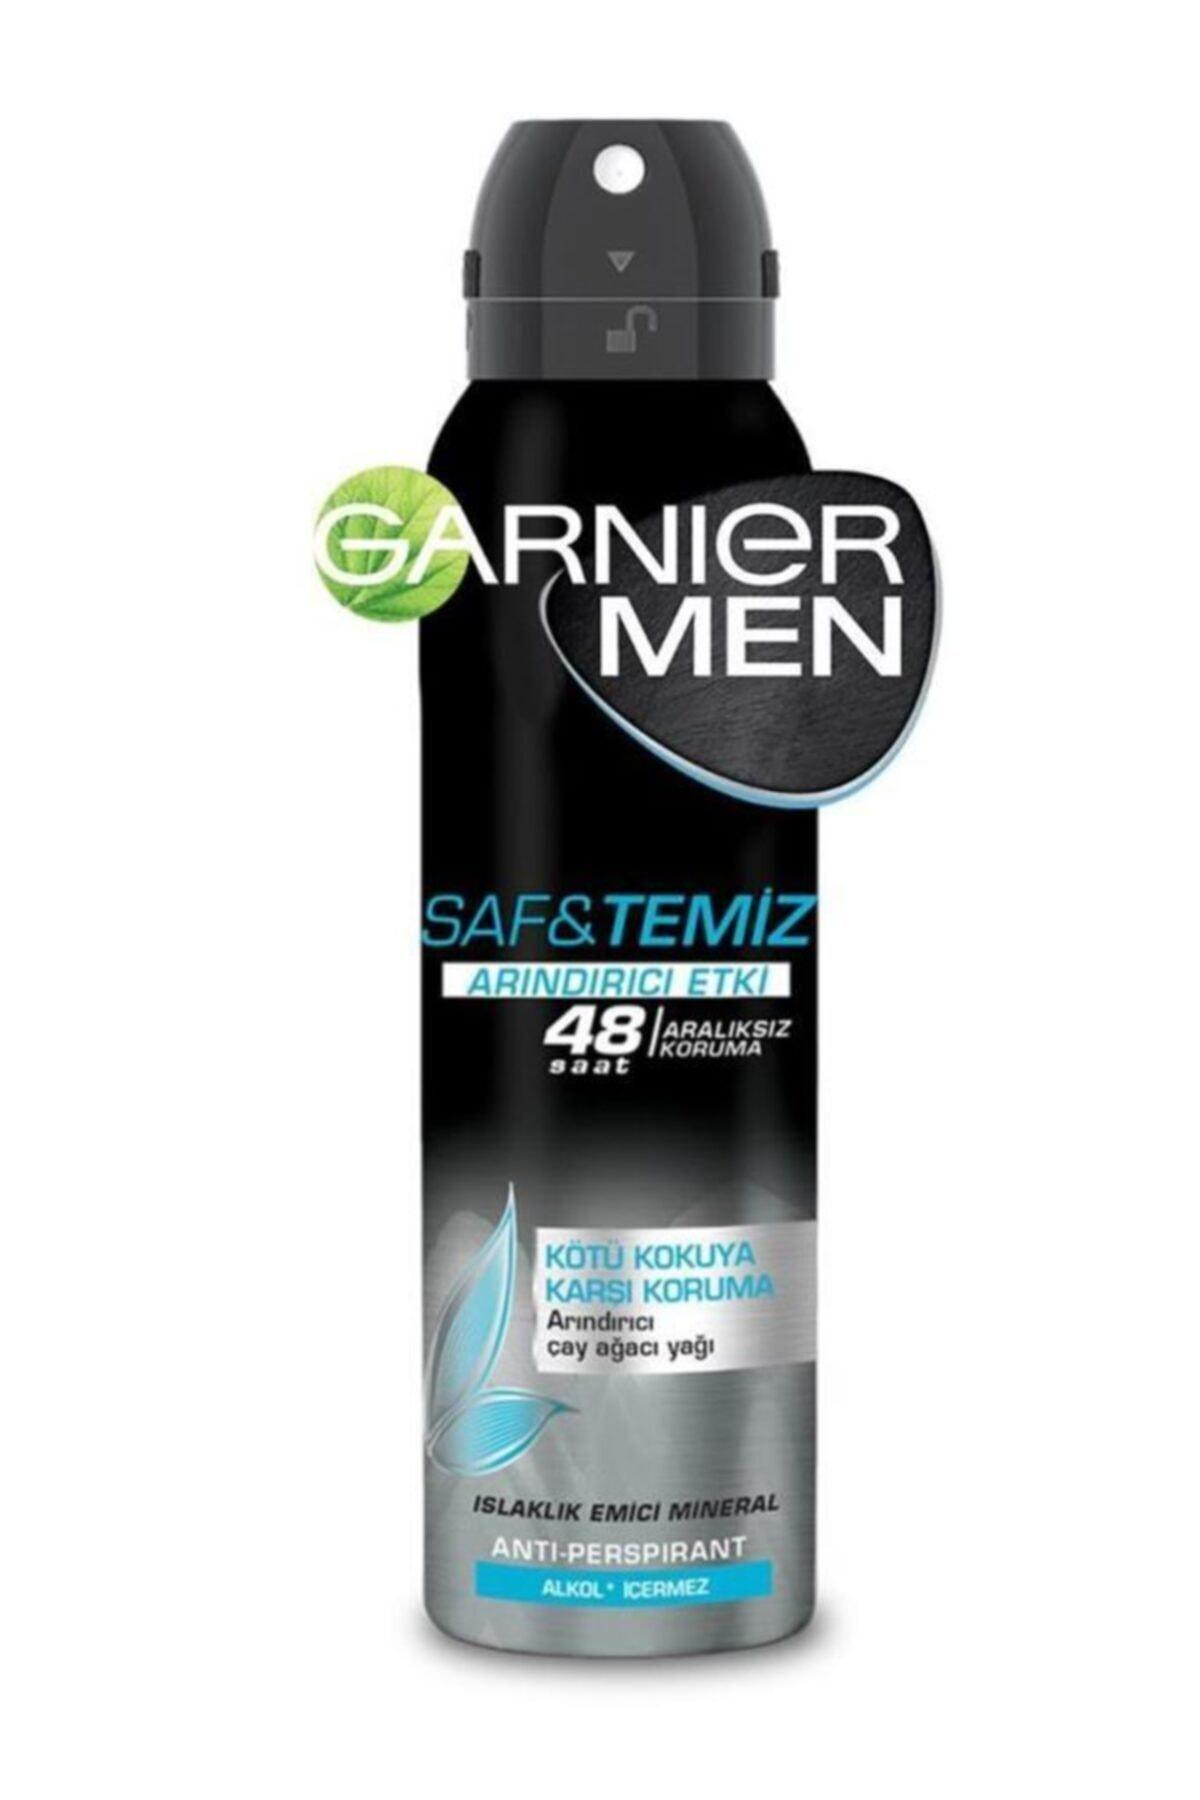 Garnier Men Saf Ve Temiz 48 Saat Deodorant 150 Ml 1